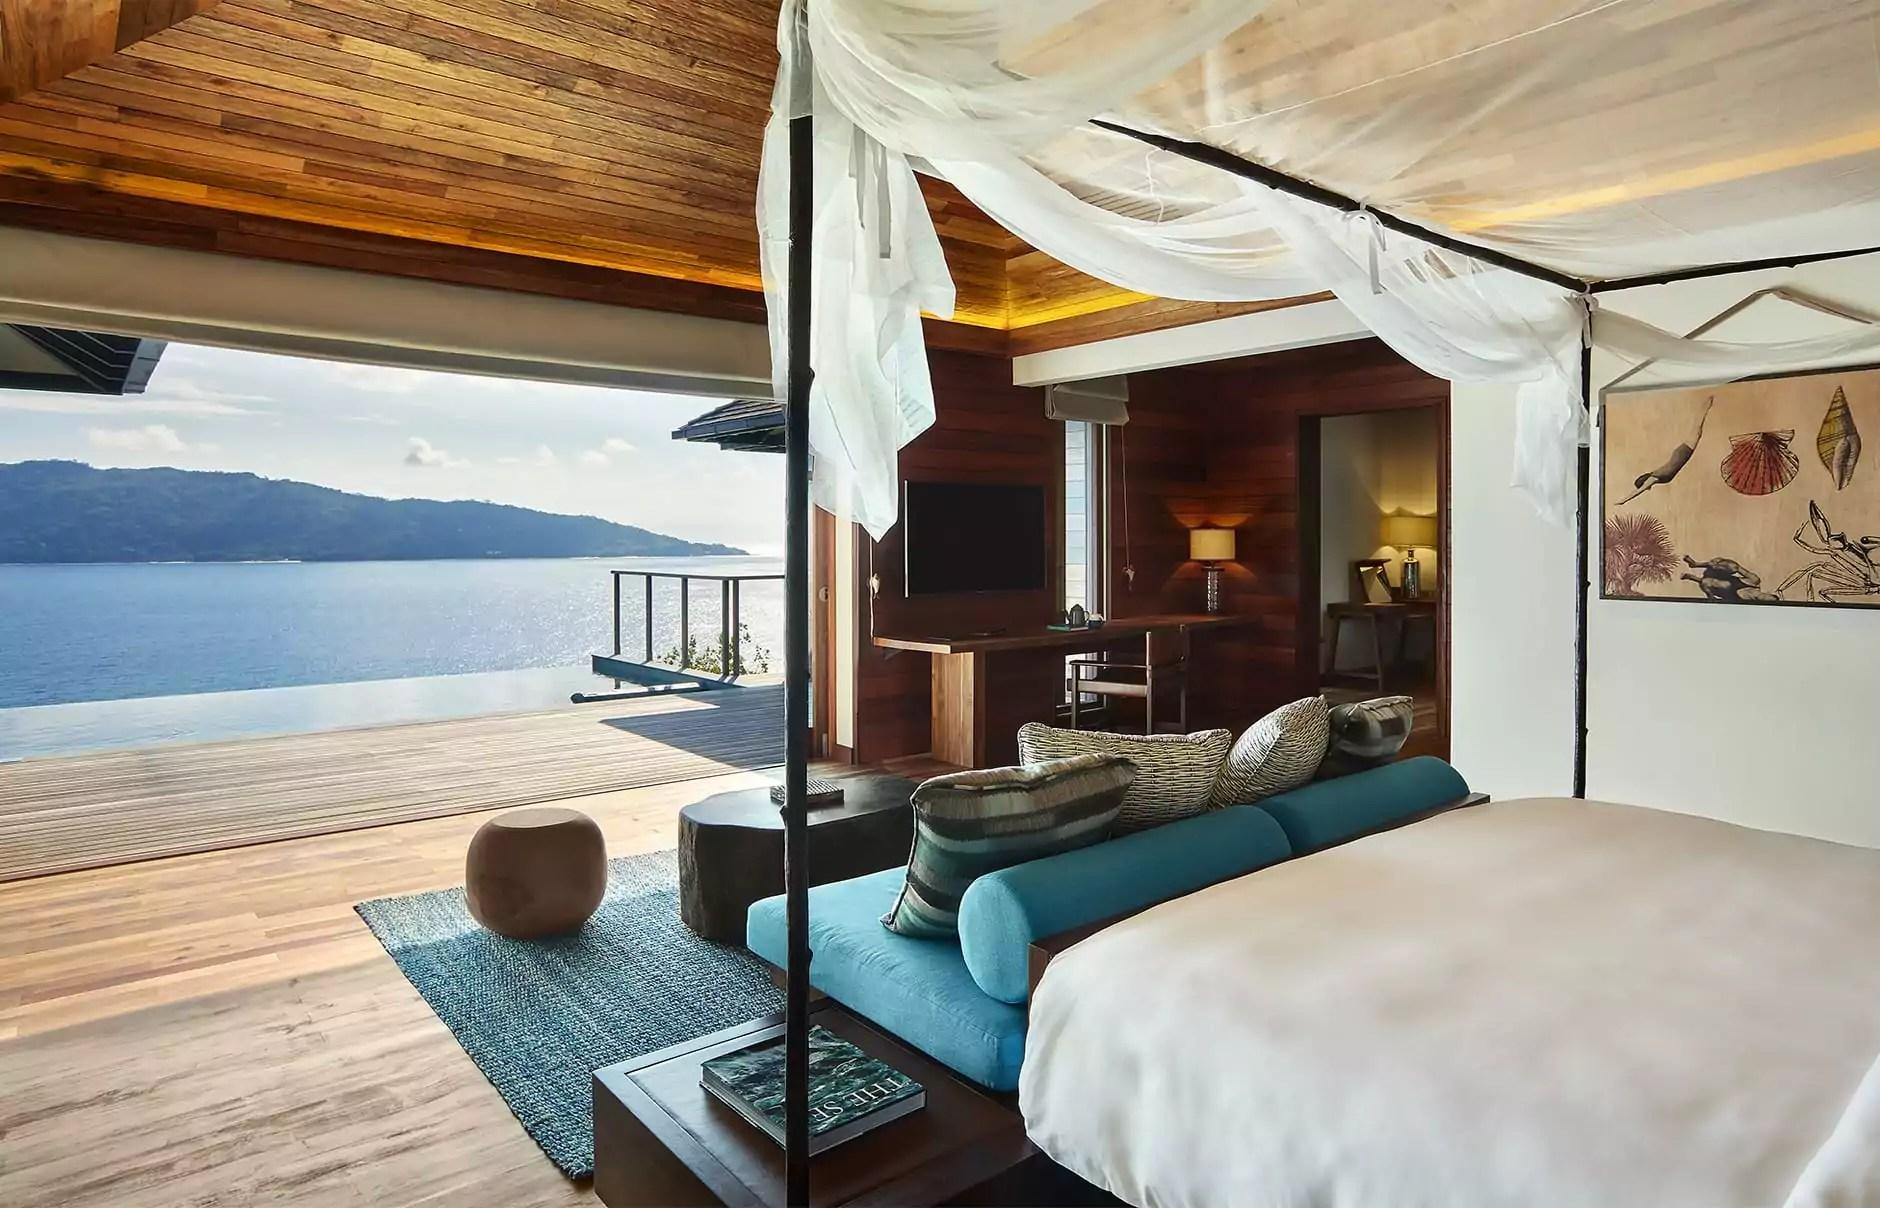 Six Senses Zil Pasyon Luxury Hotels Travelplusstyle